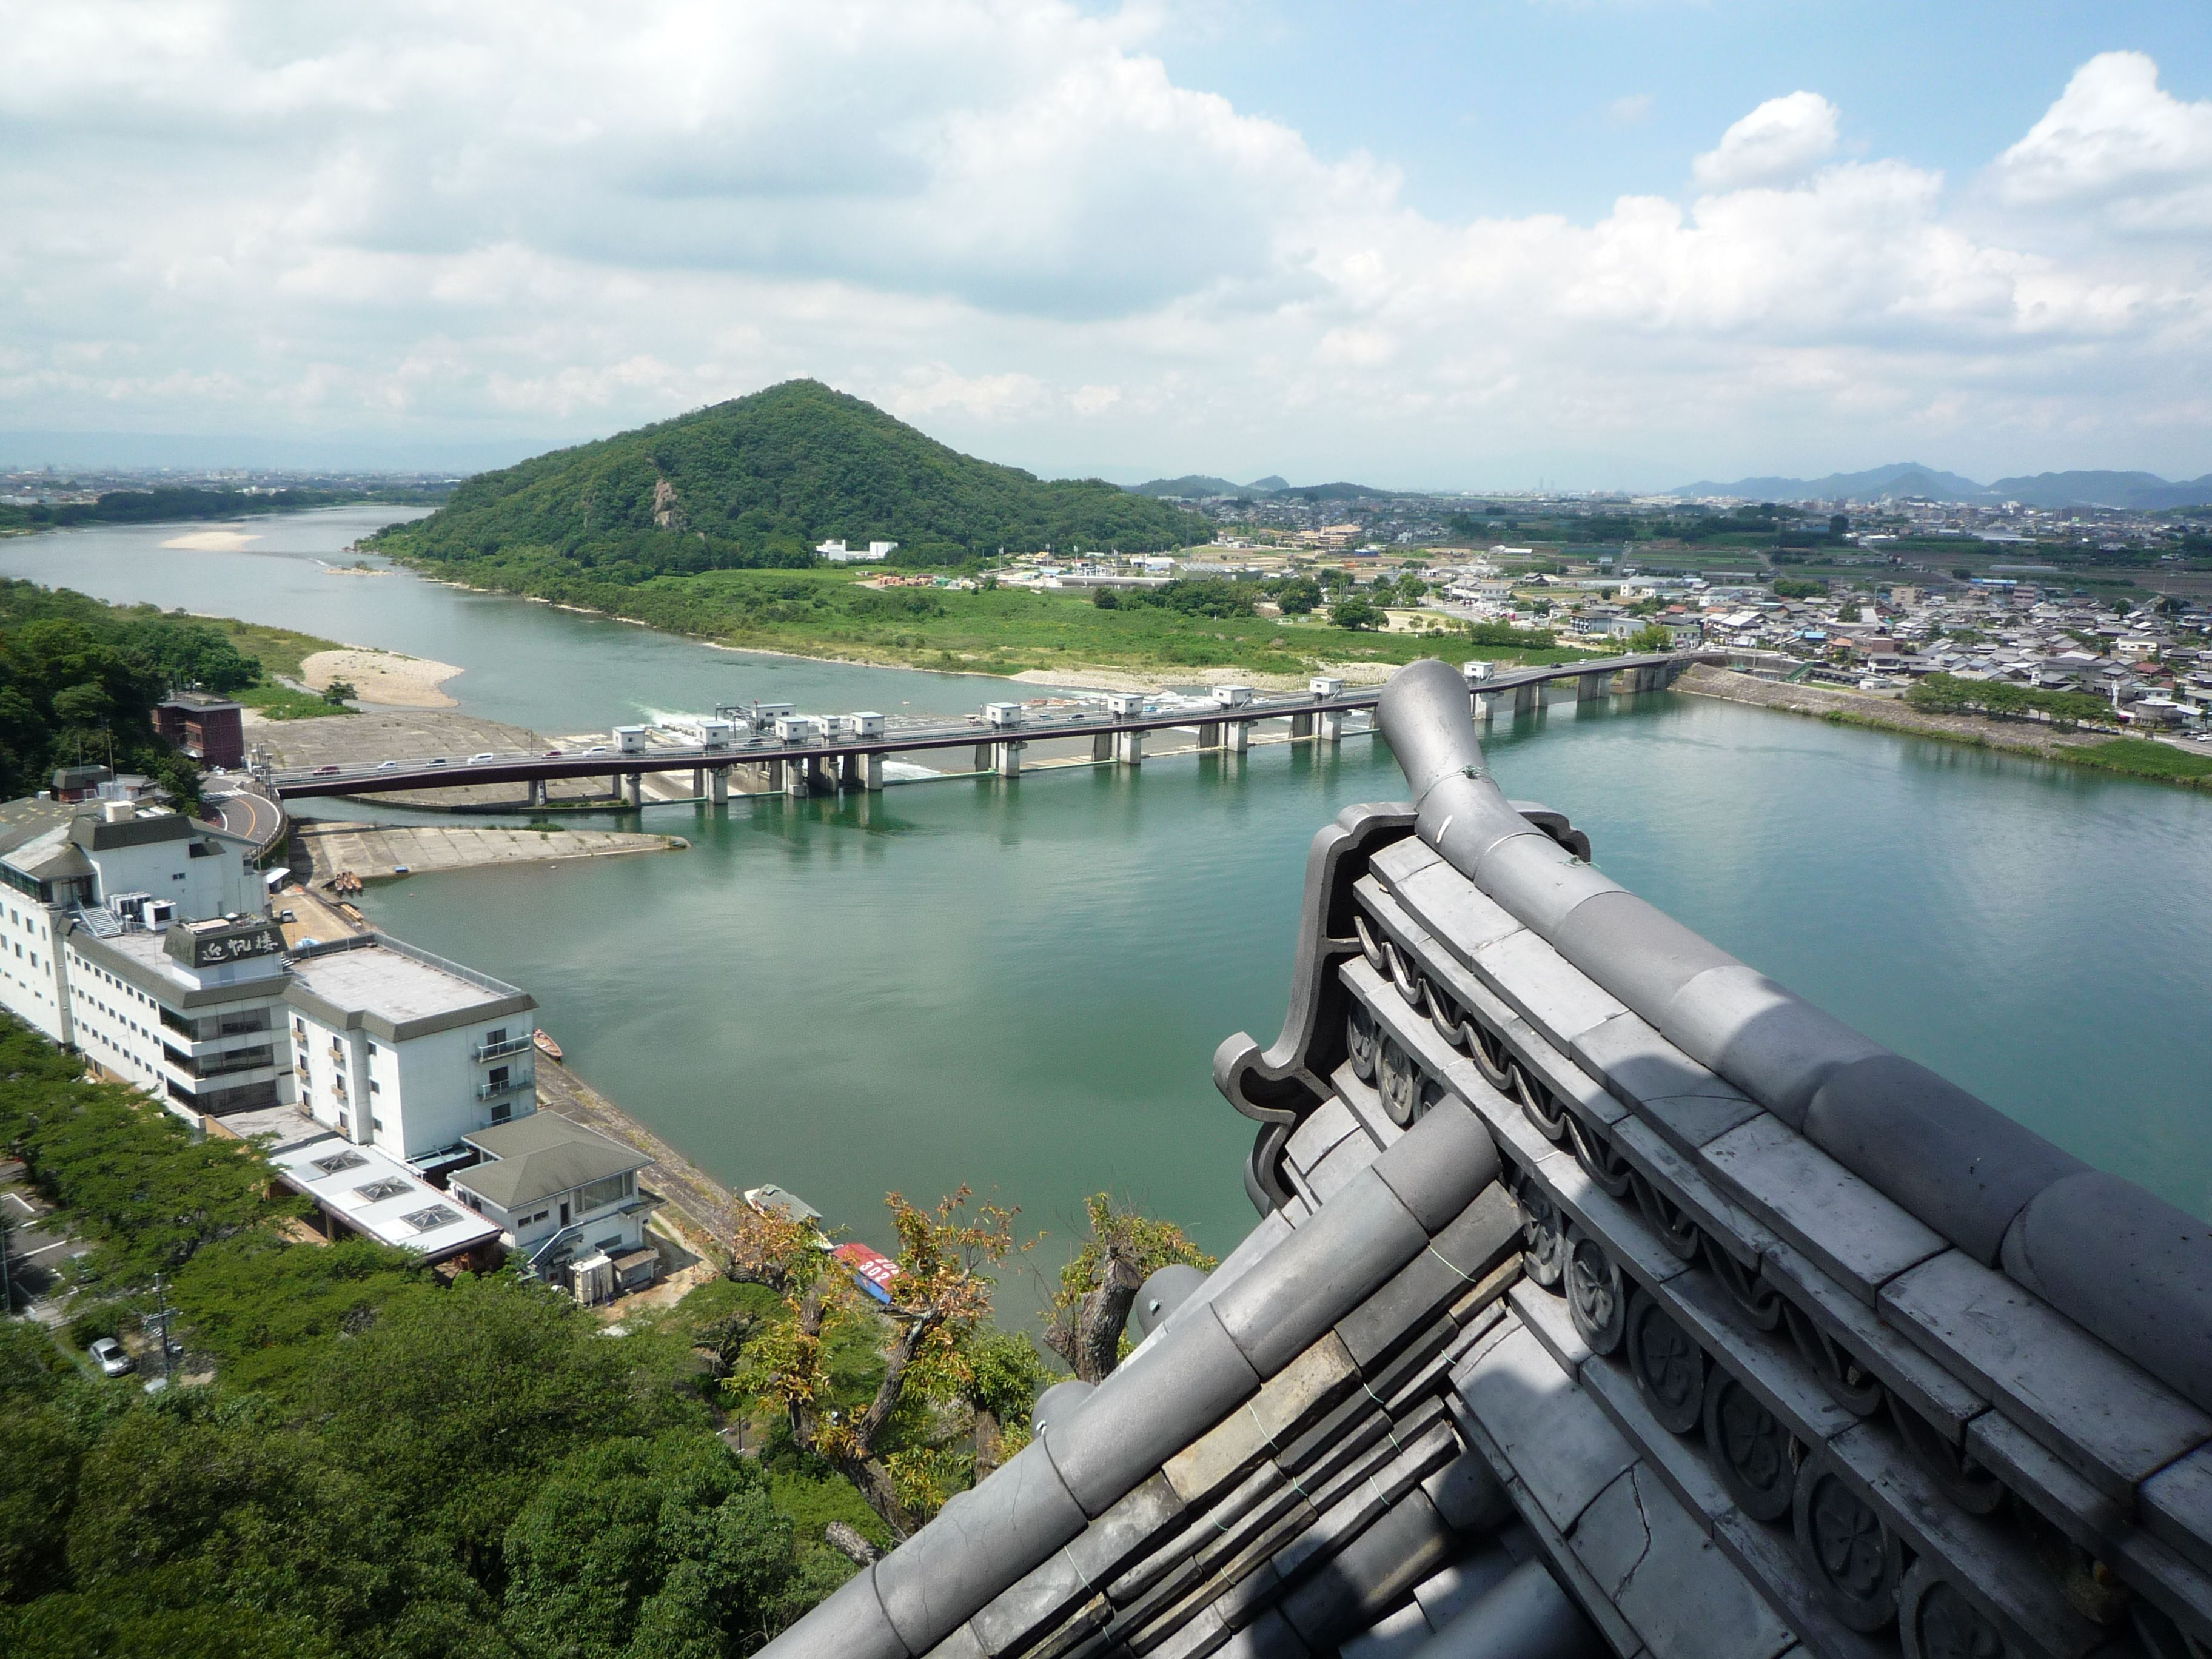 Landscape from Inuyama Castle